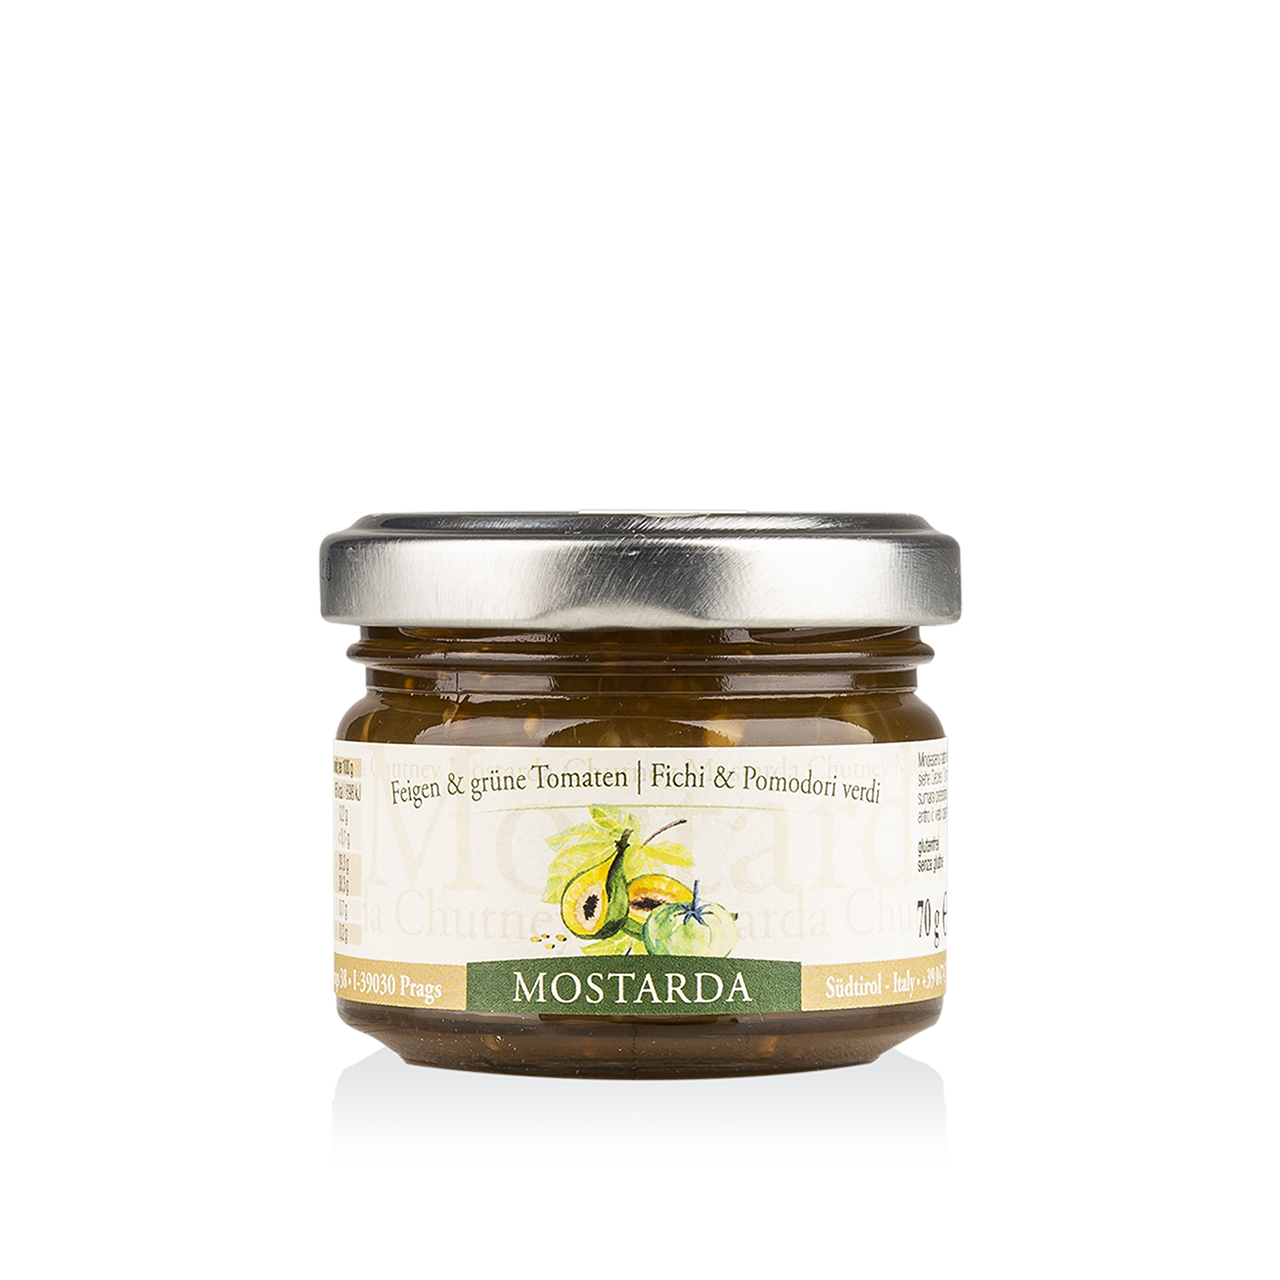 Chutney - Mostarda Feige & grüne Tomate 70g